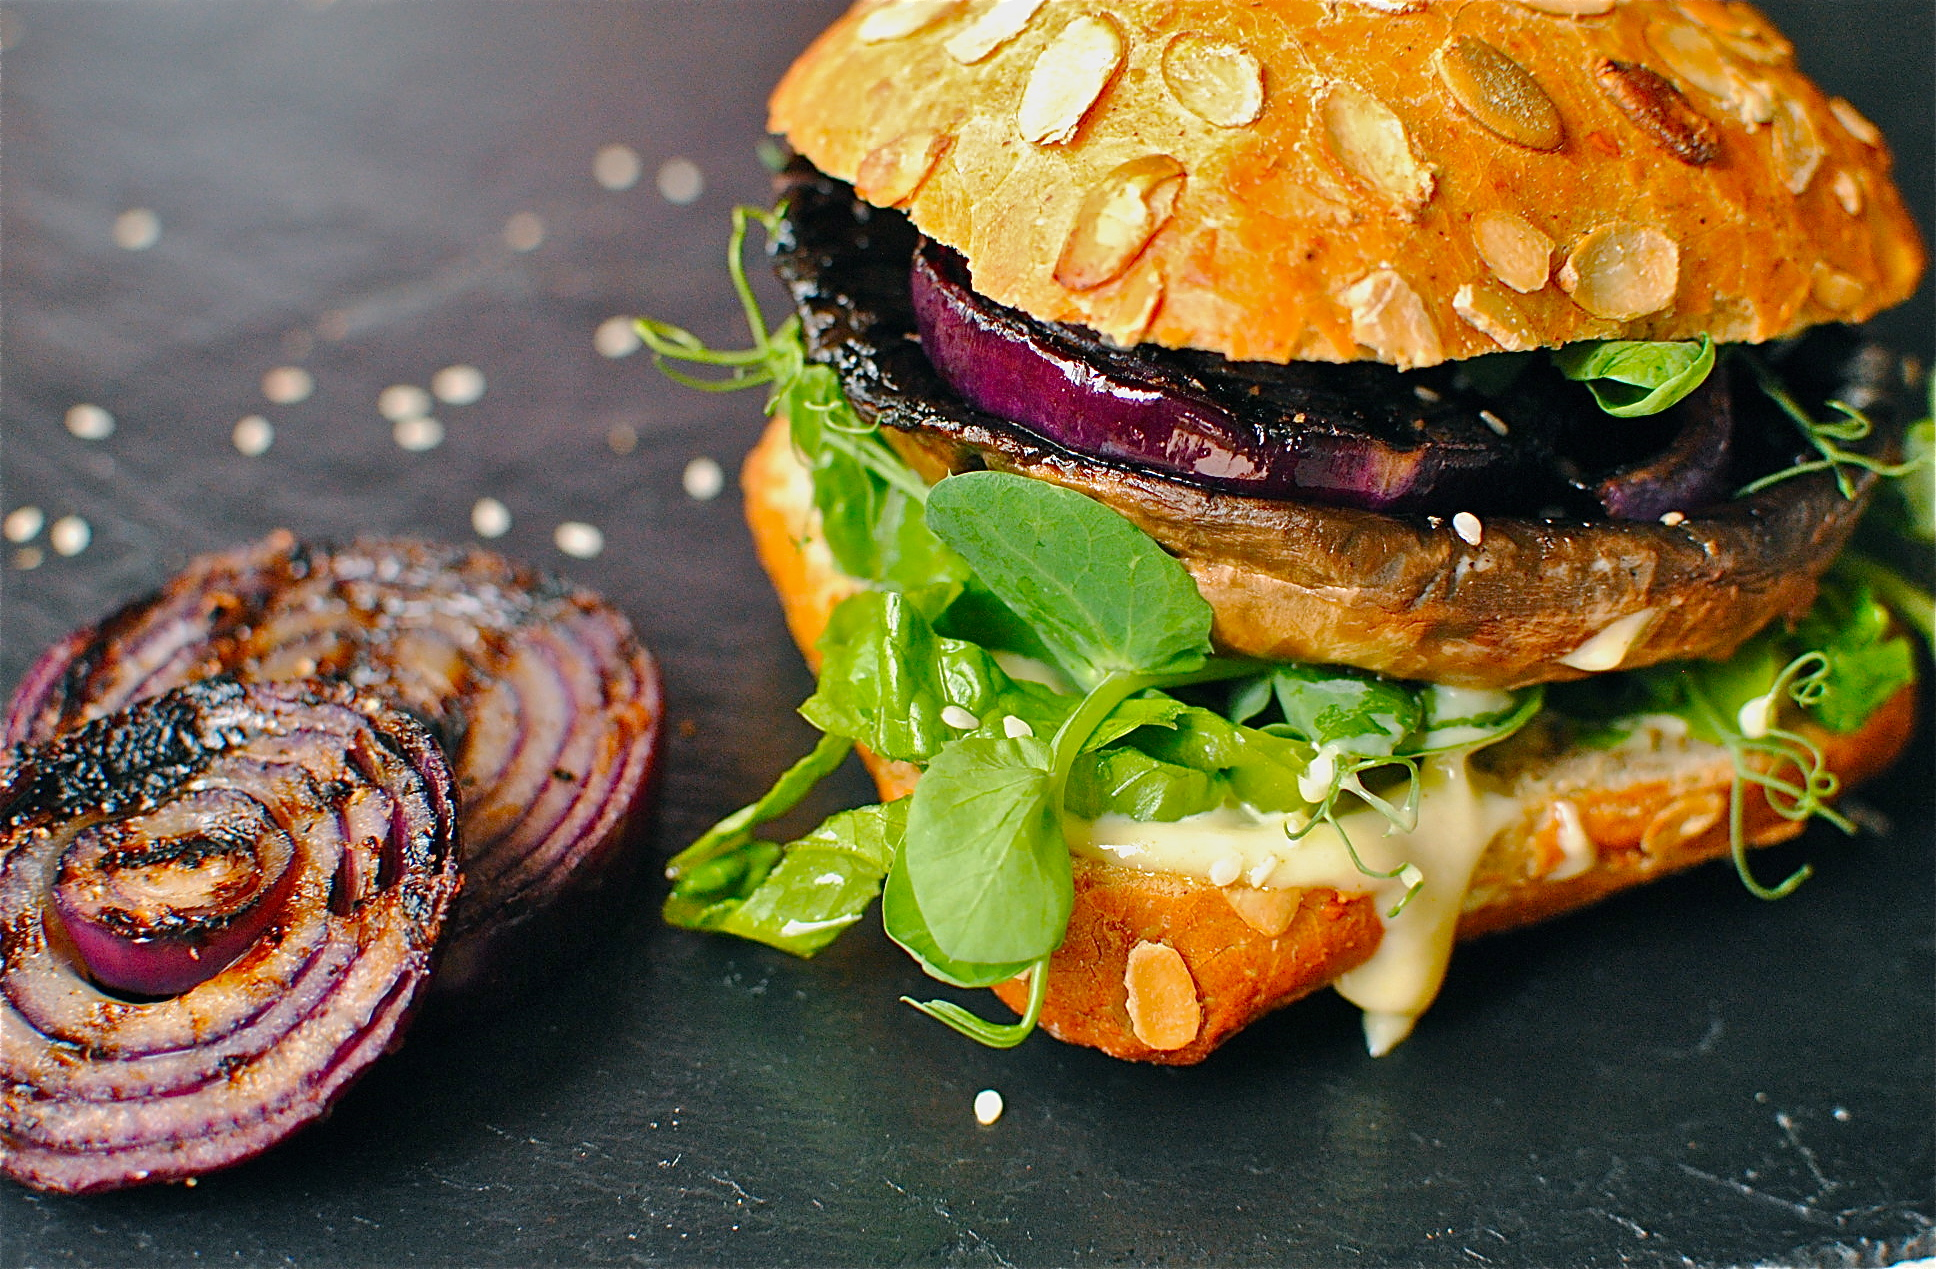 Juicy Teriyaki Portobello Mushroom Burgers With Homemade